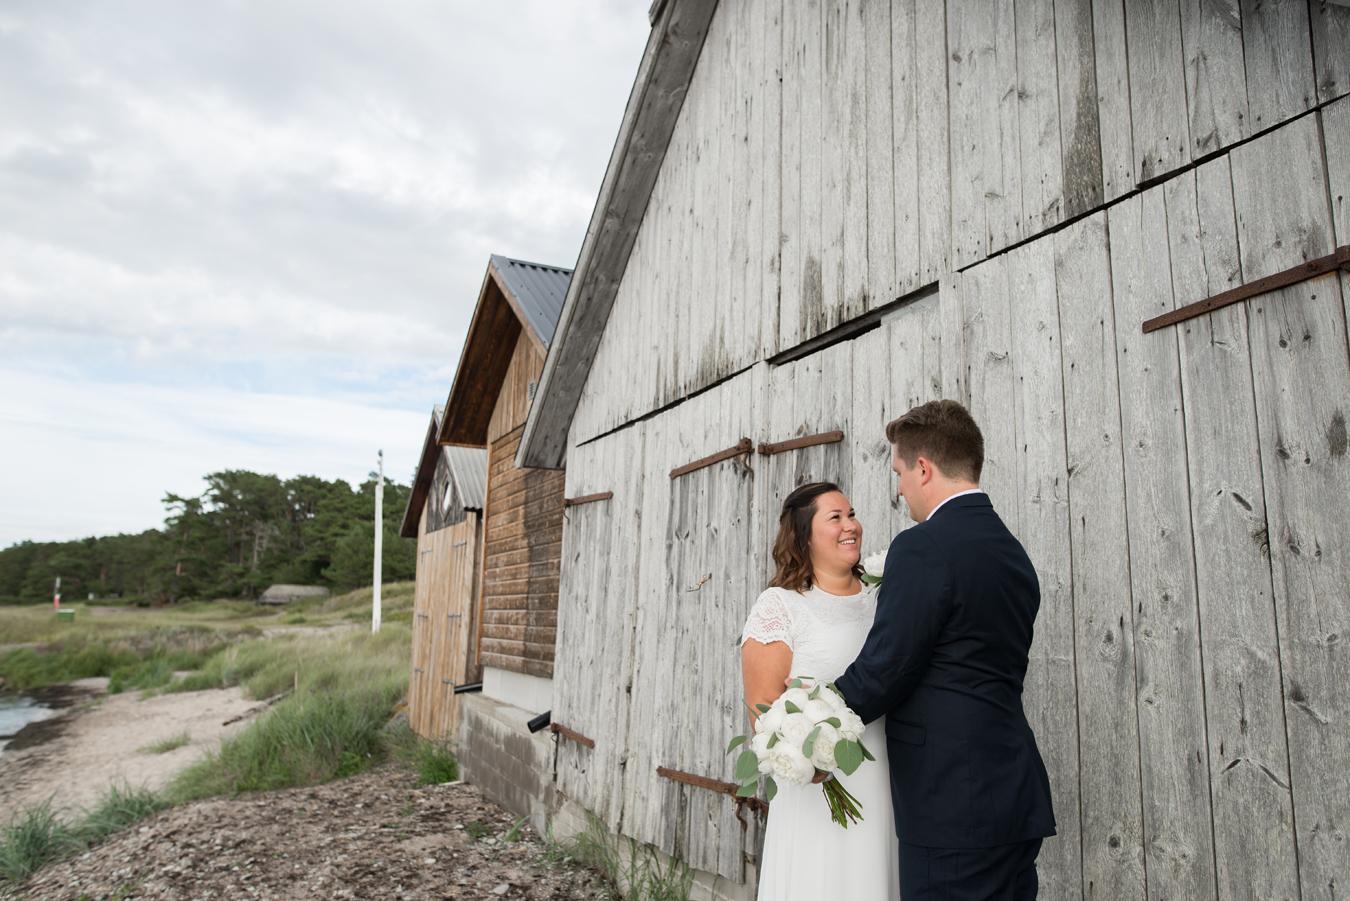 113-bröllopsfotograf-gotland-ekstakusten-neas-fotografi.jpg